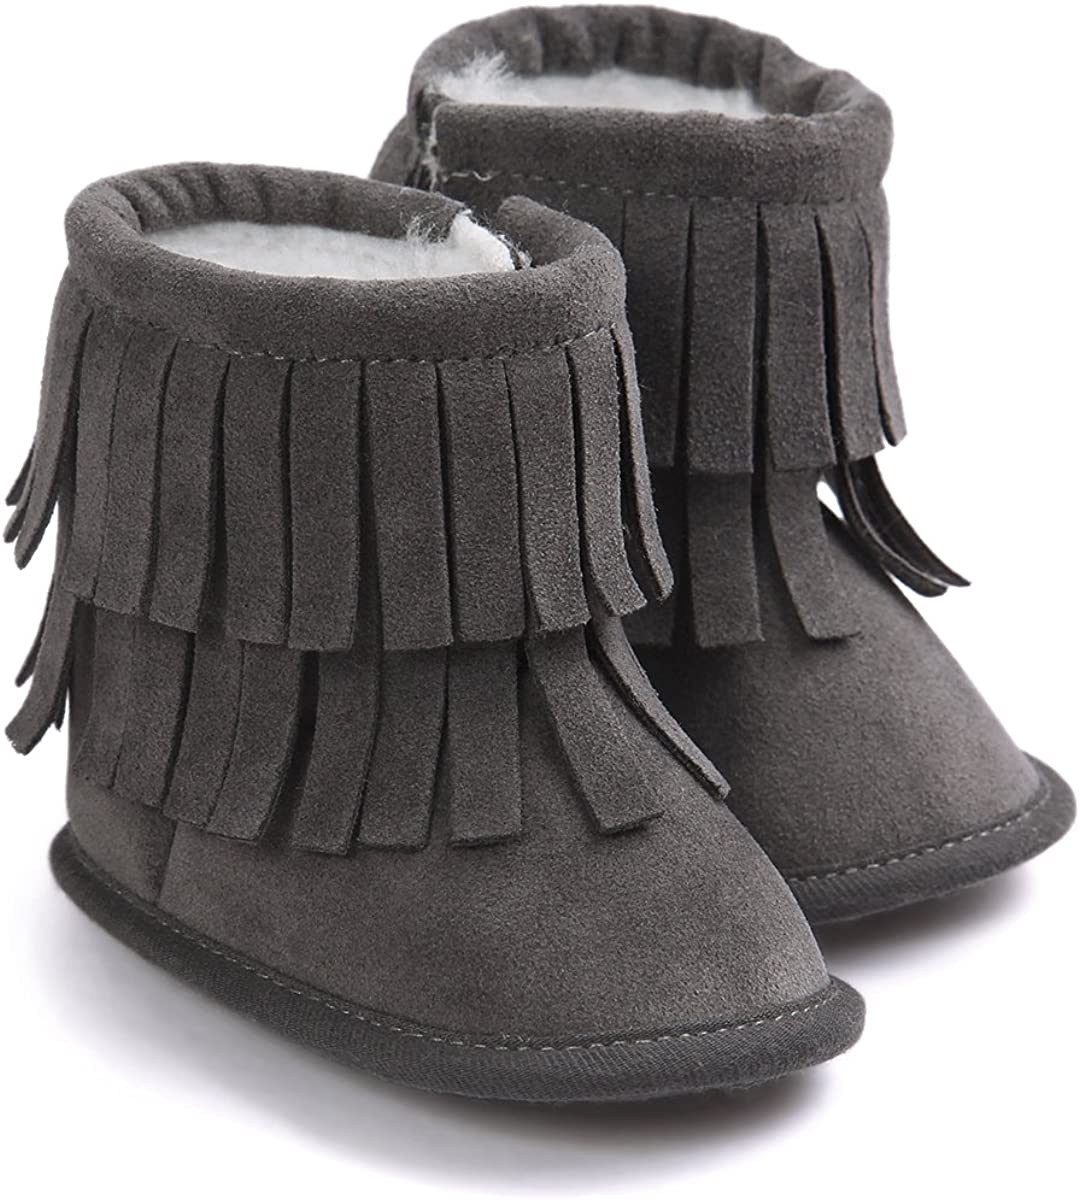 Vanbuy Baby Boys Girls Bear Paw Animal Winter Slippers Boots Infant Crib Shoes